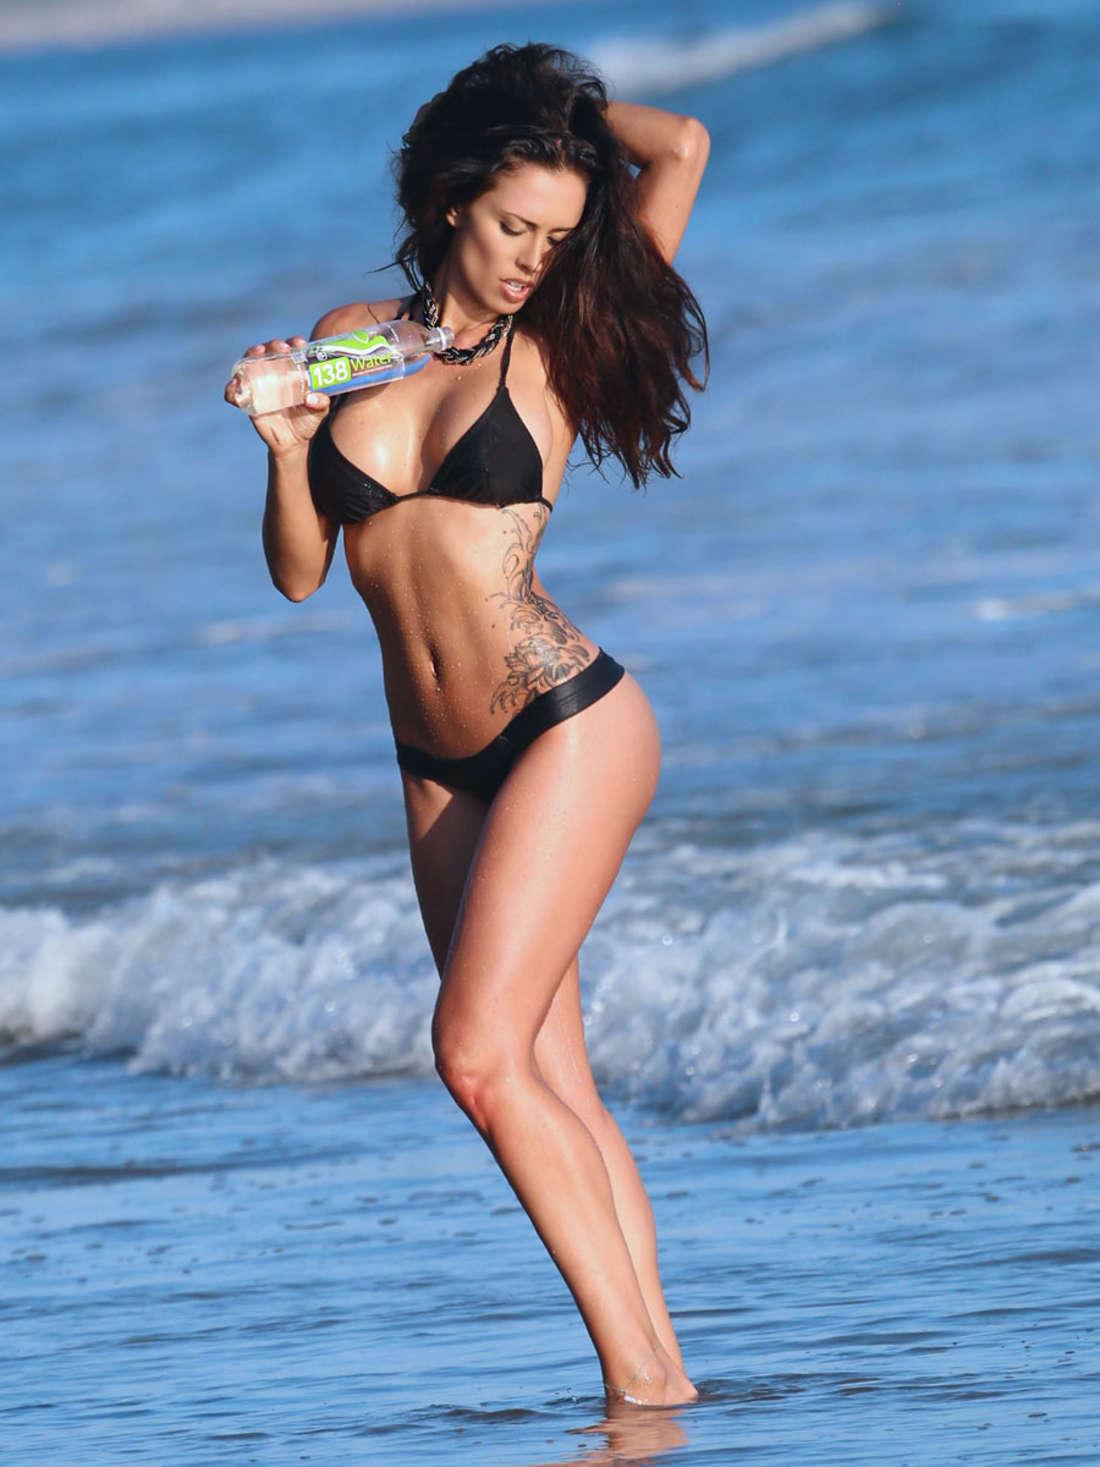 Paparazzi Charissa Littlejohn nude (55 images), Hot